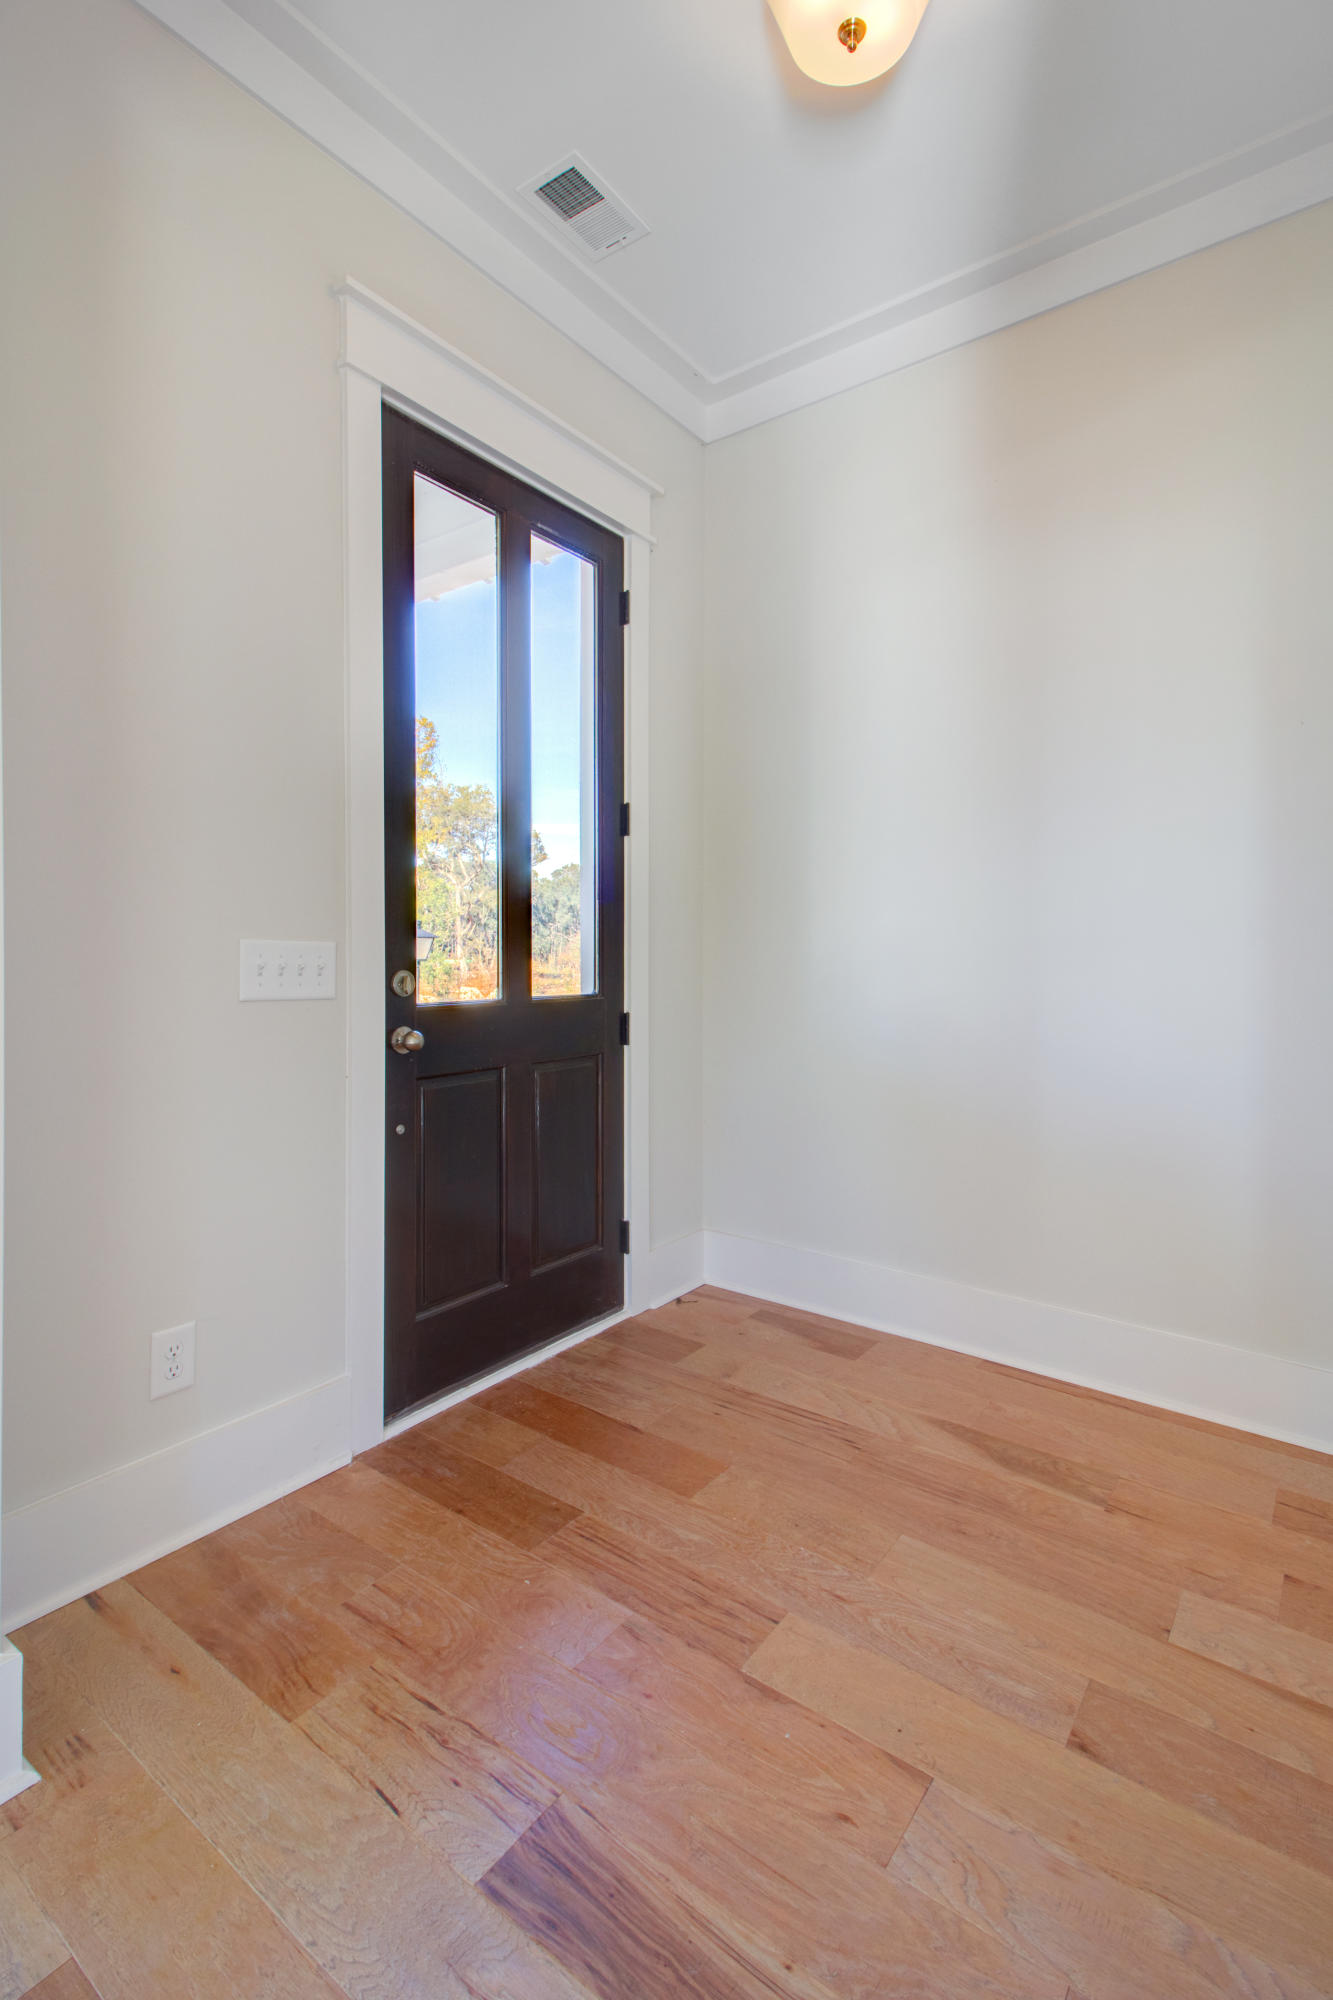 Fulton Park Homes For Sale - 1206 Max, Mount Pleasant, SC - 23